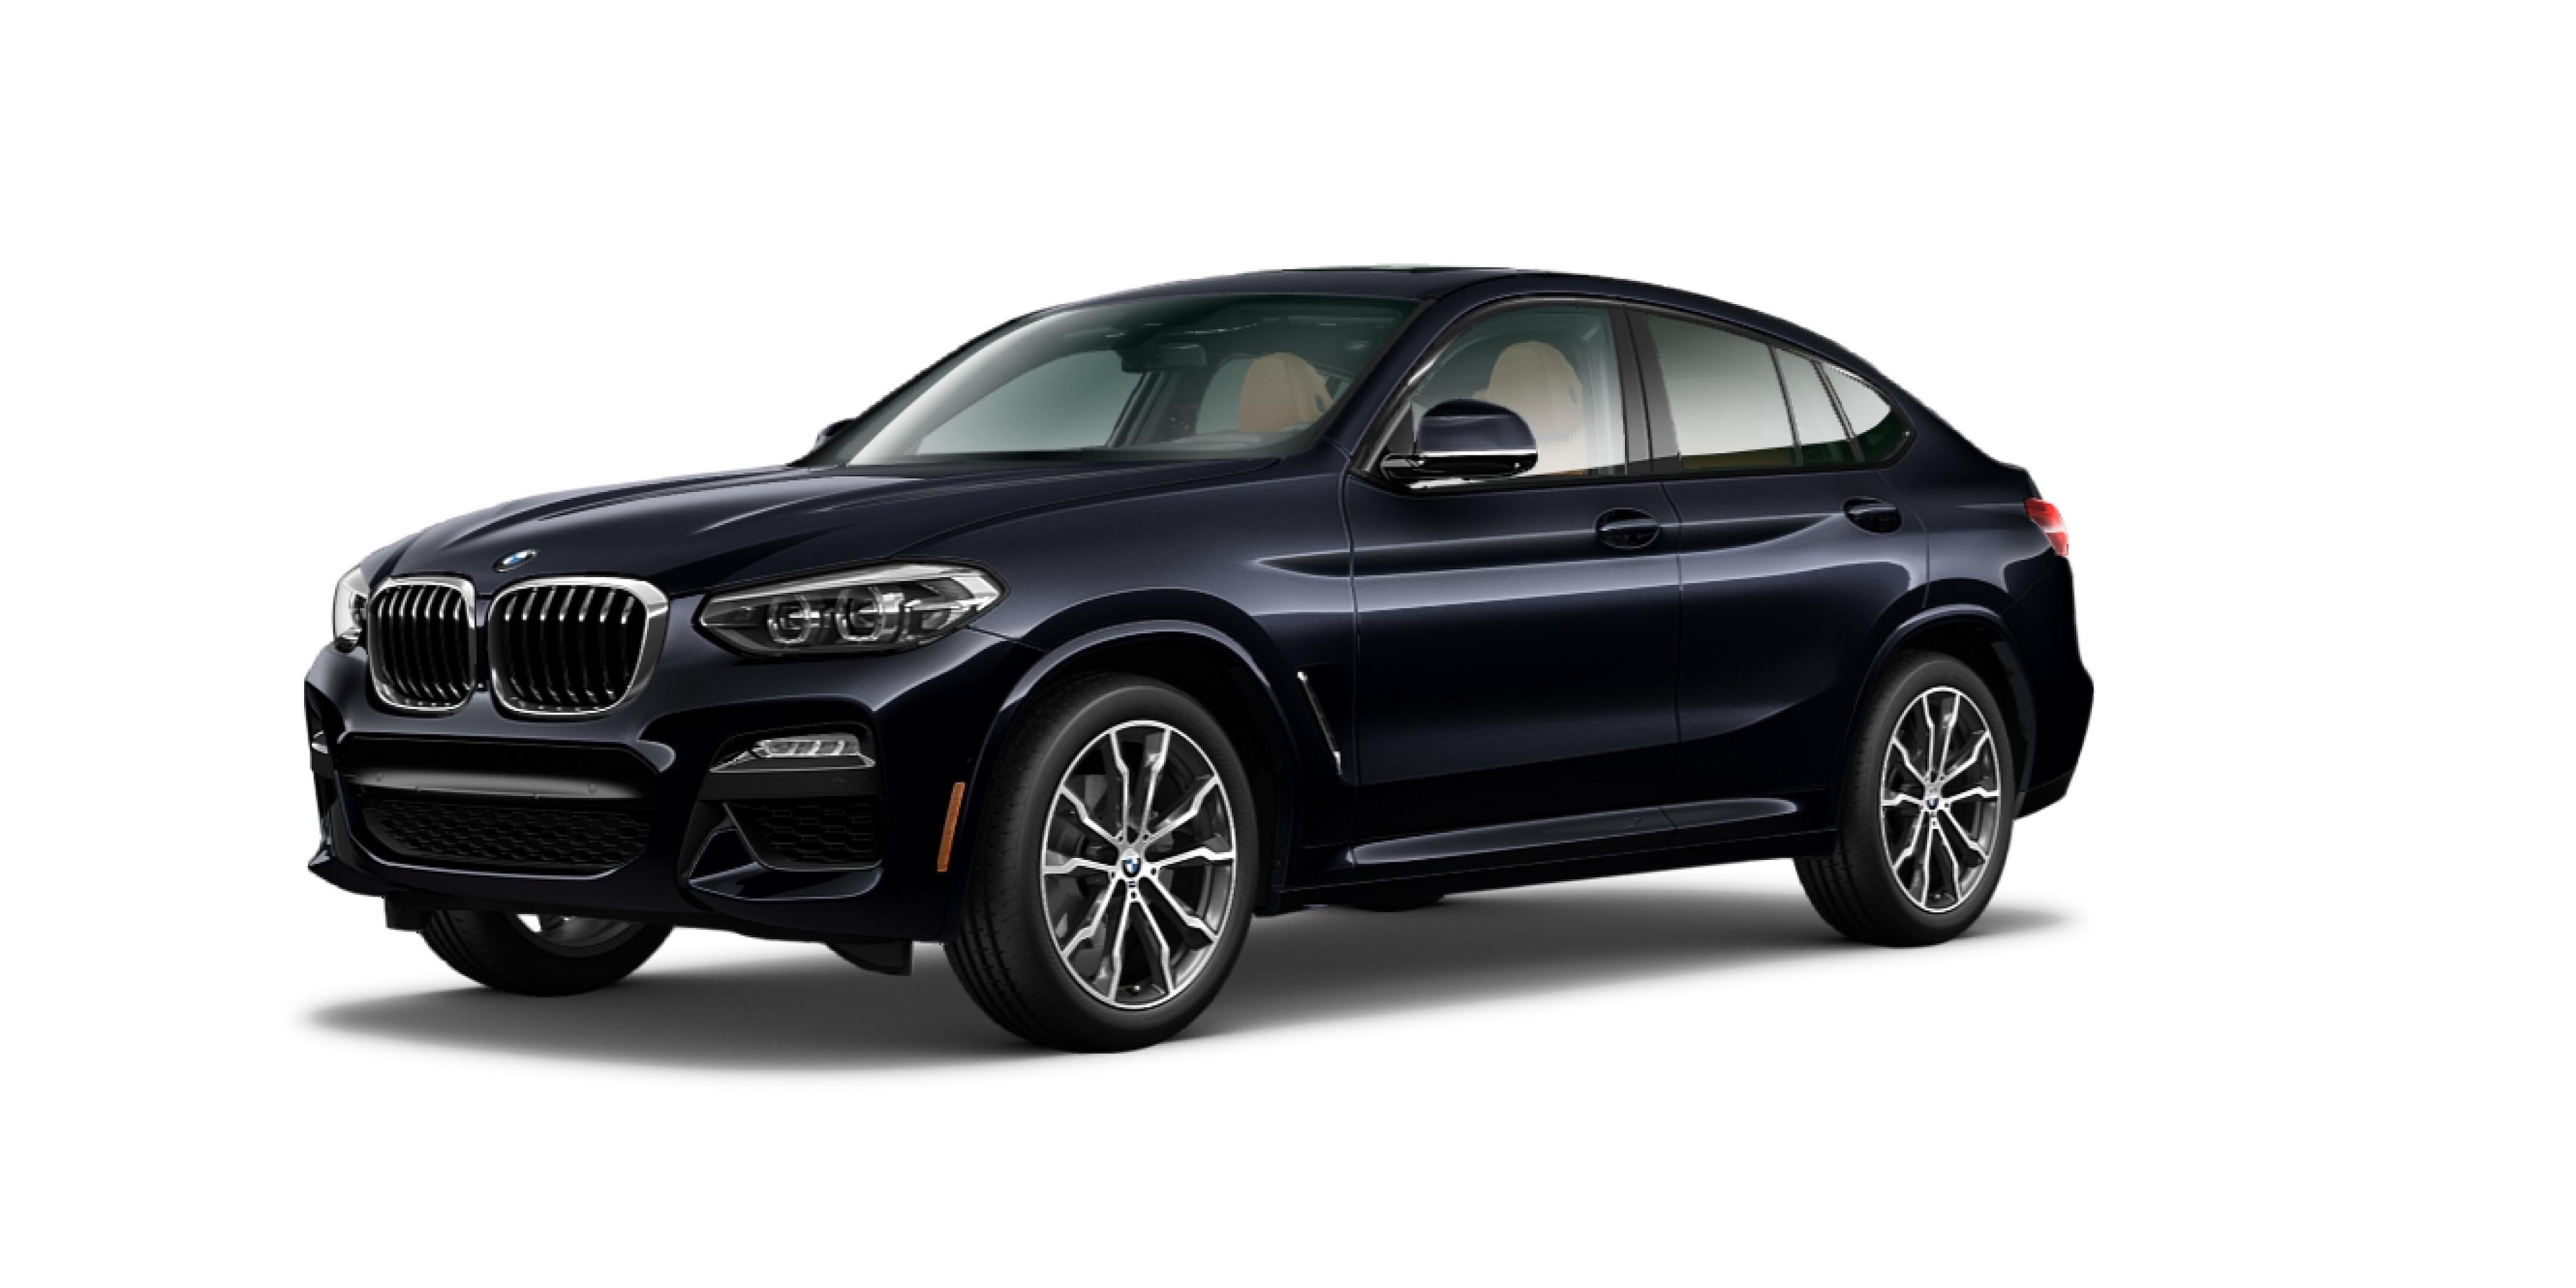 2020 BMW X4 xDrive30i SUV